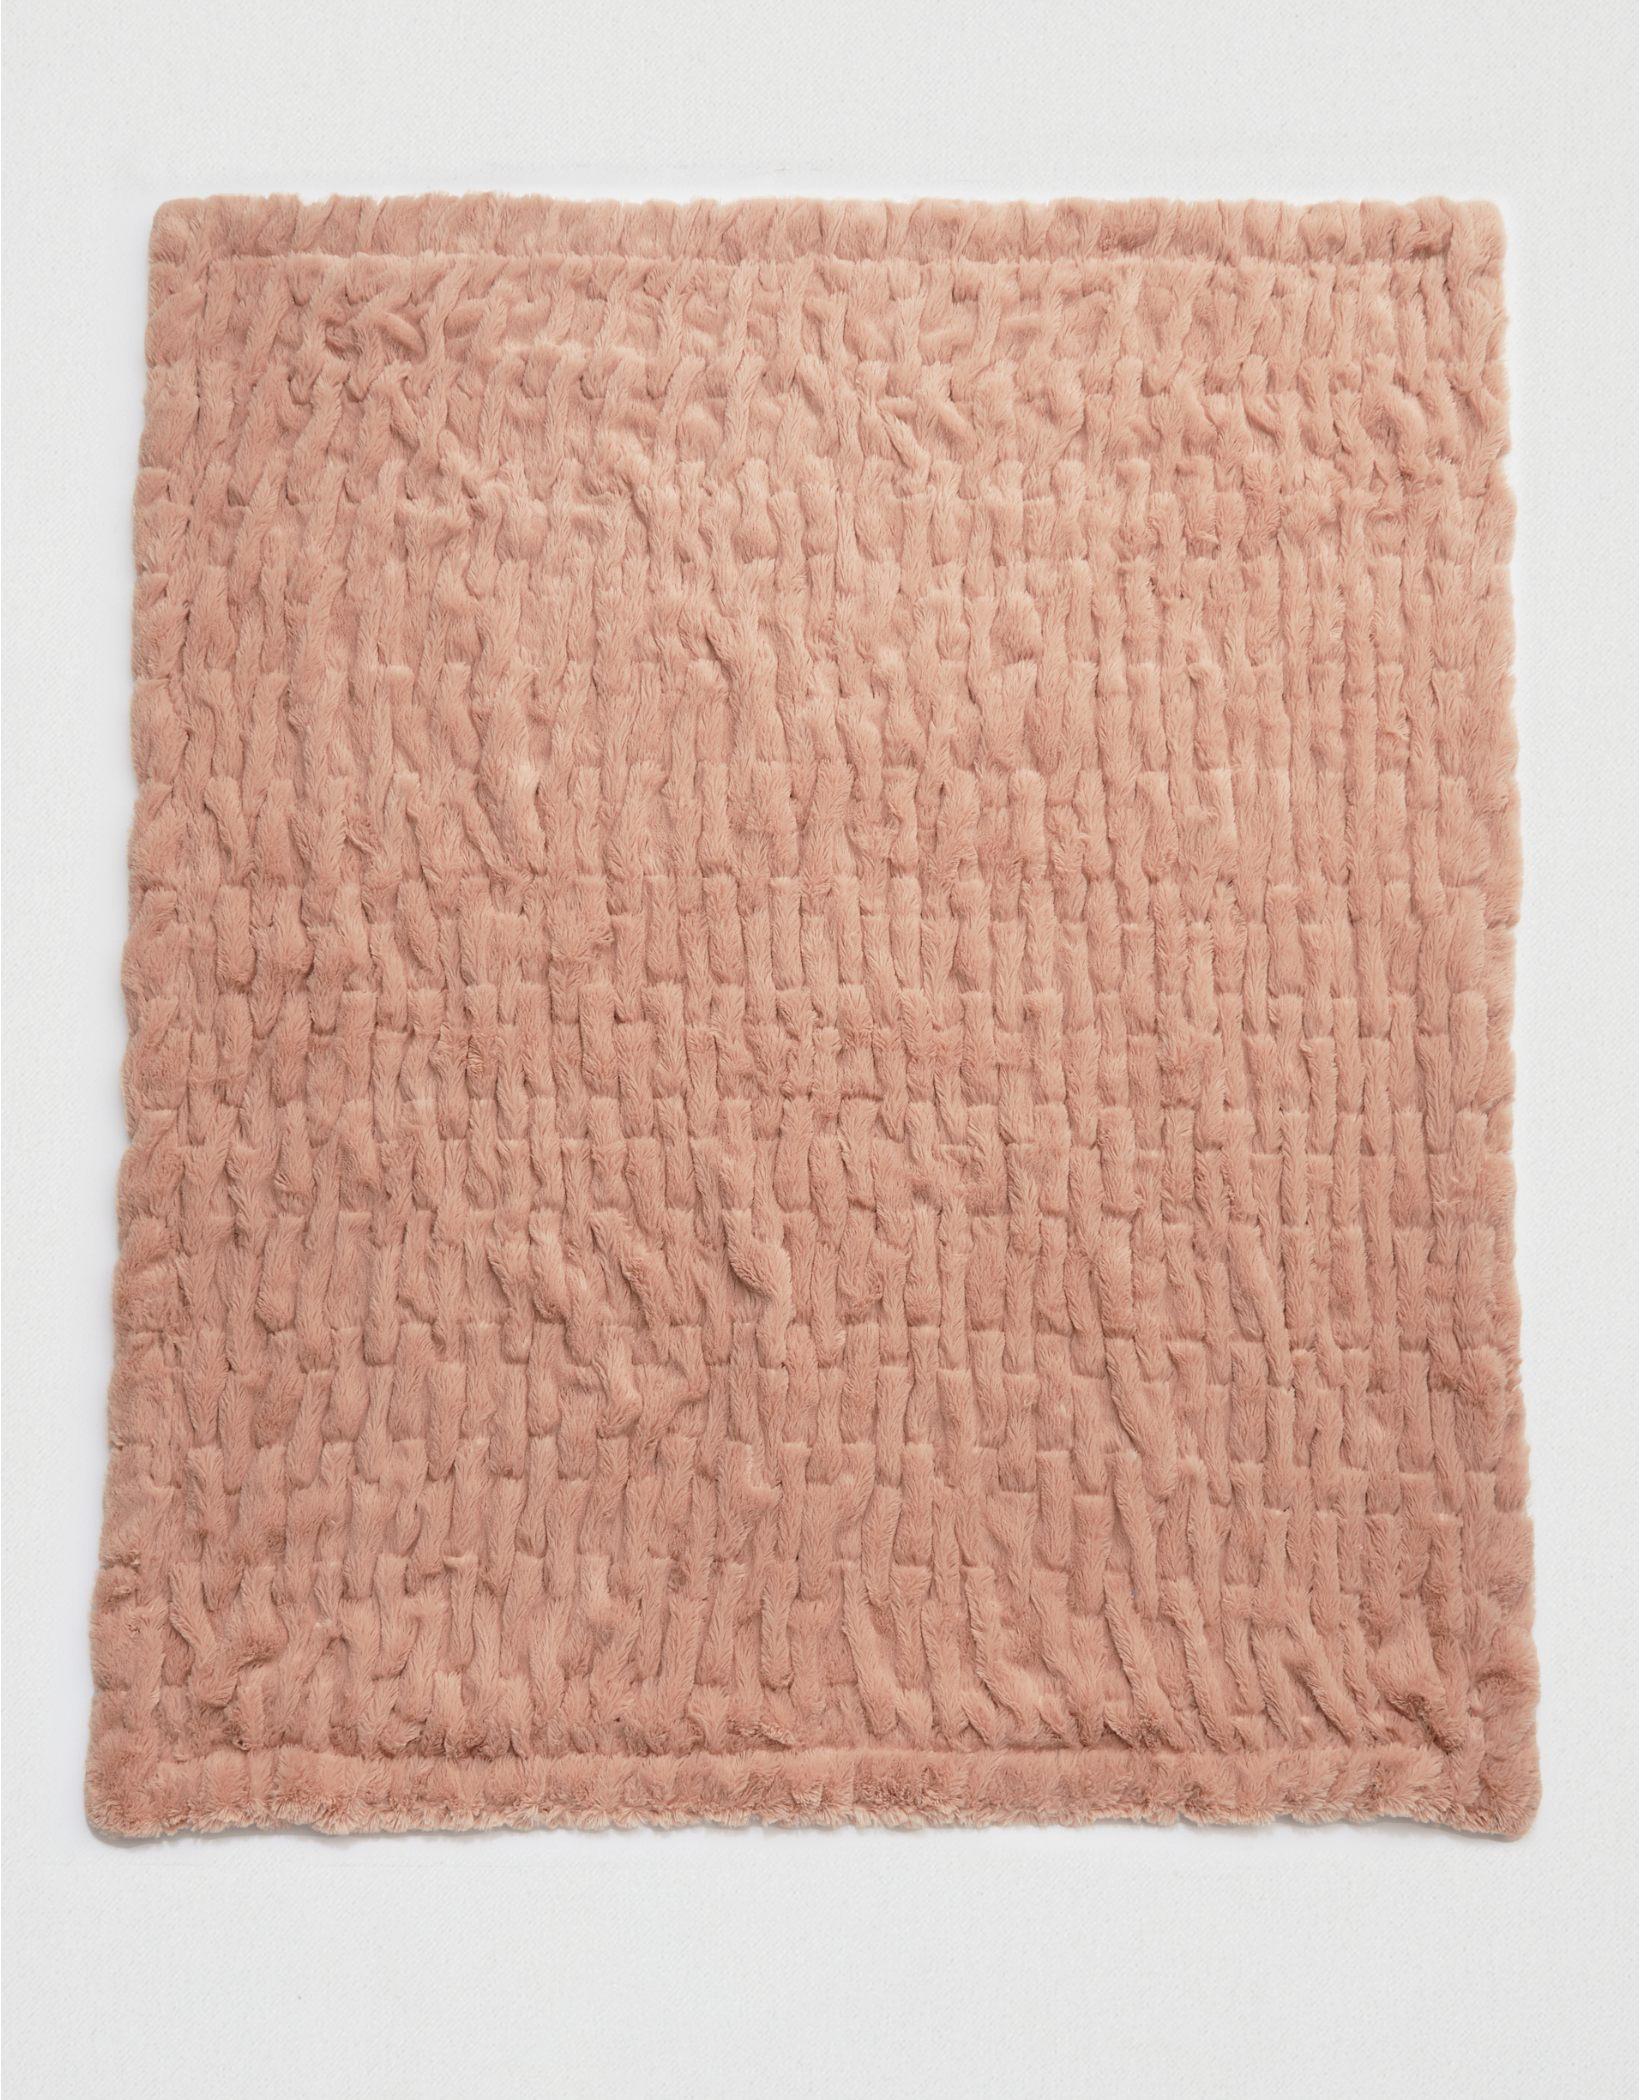 Sculped Throw Blanket